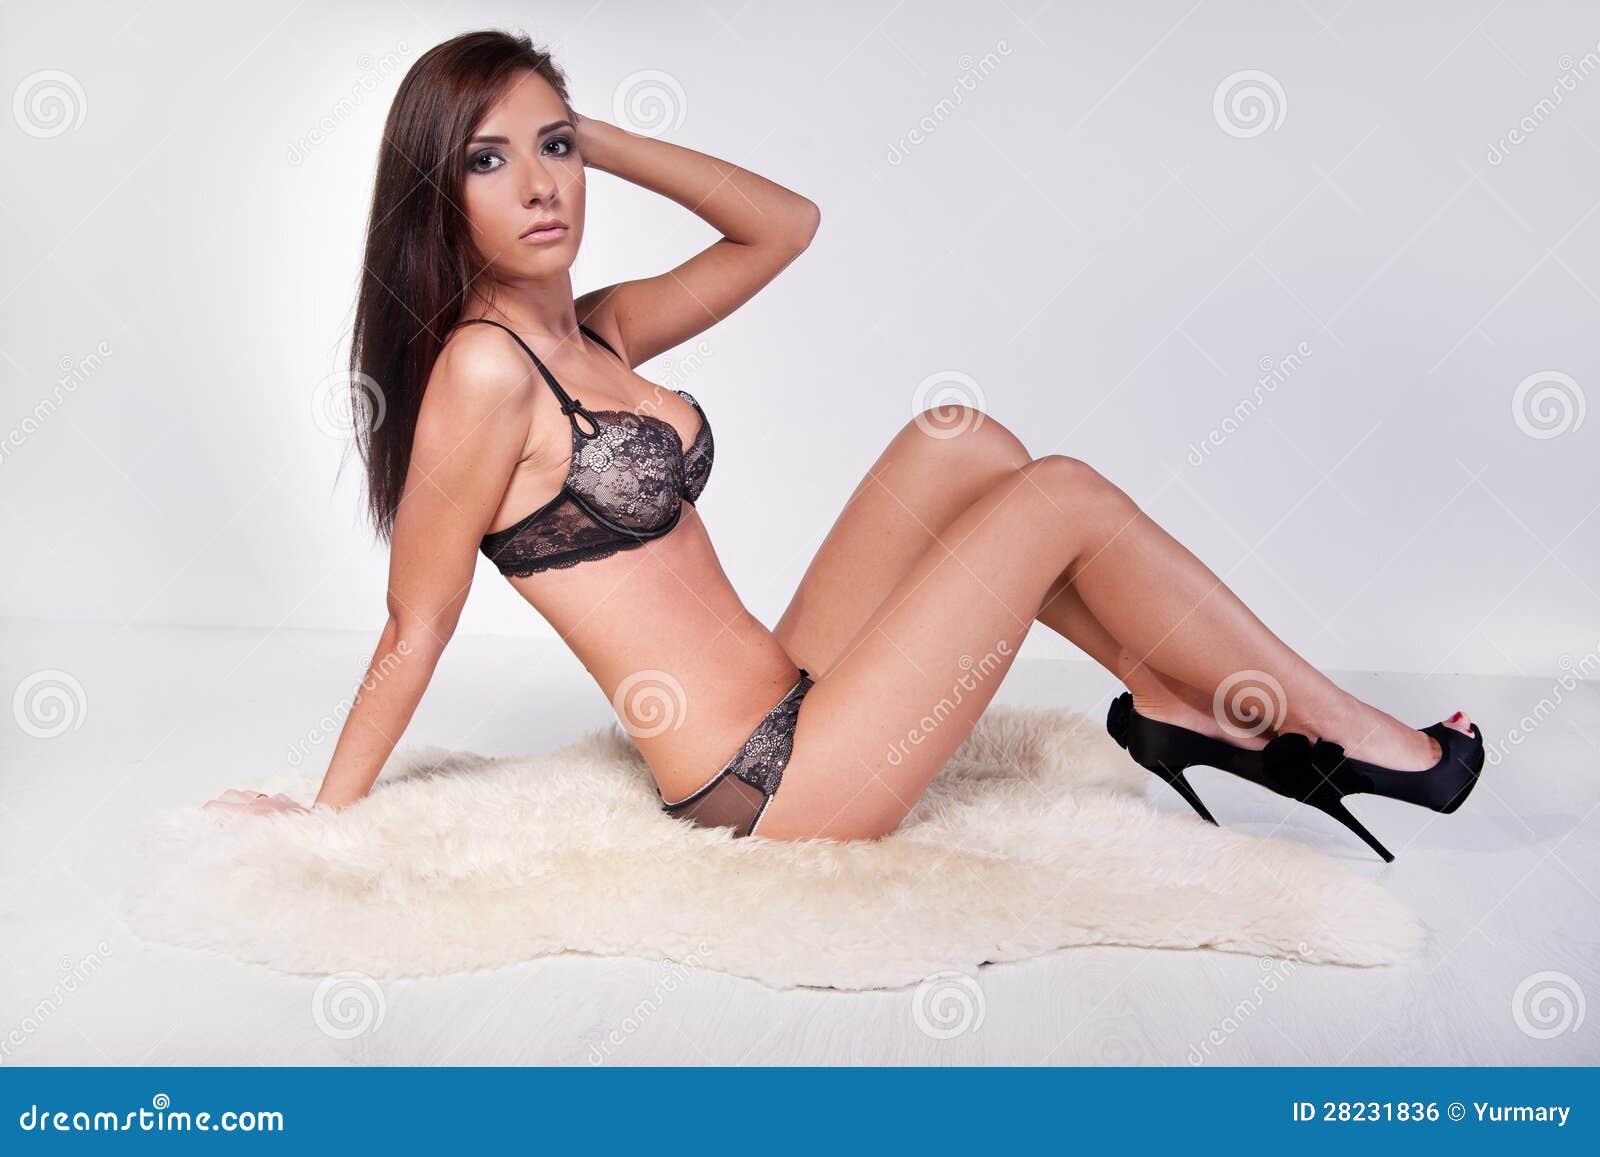 Seduced by a cougar porn Nude Photos 28